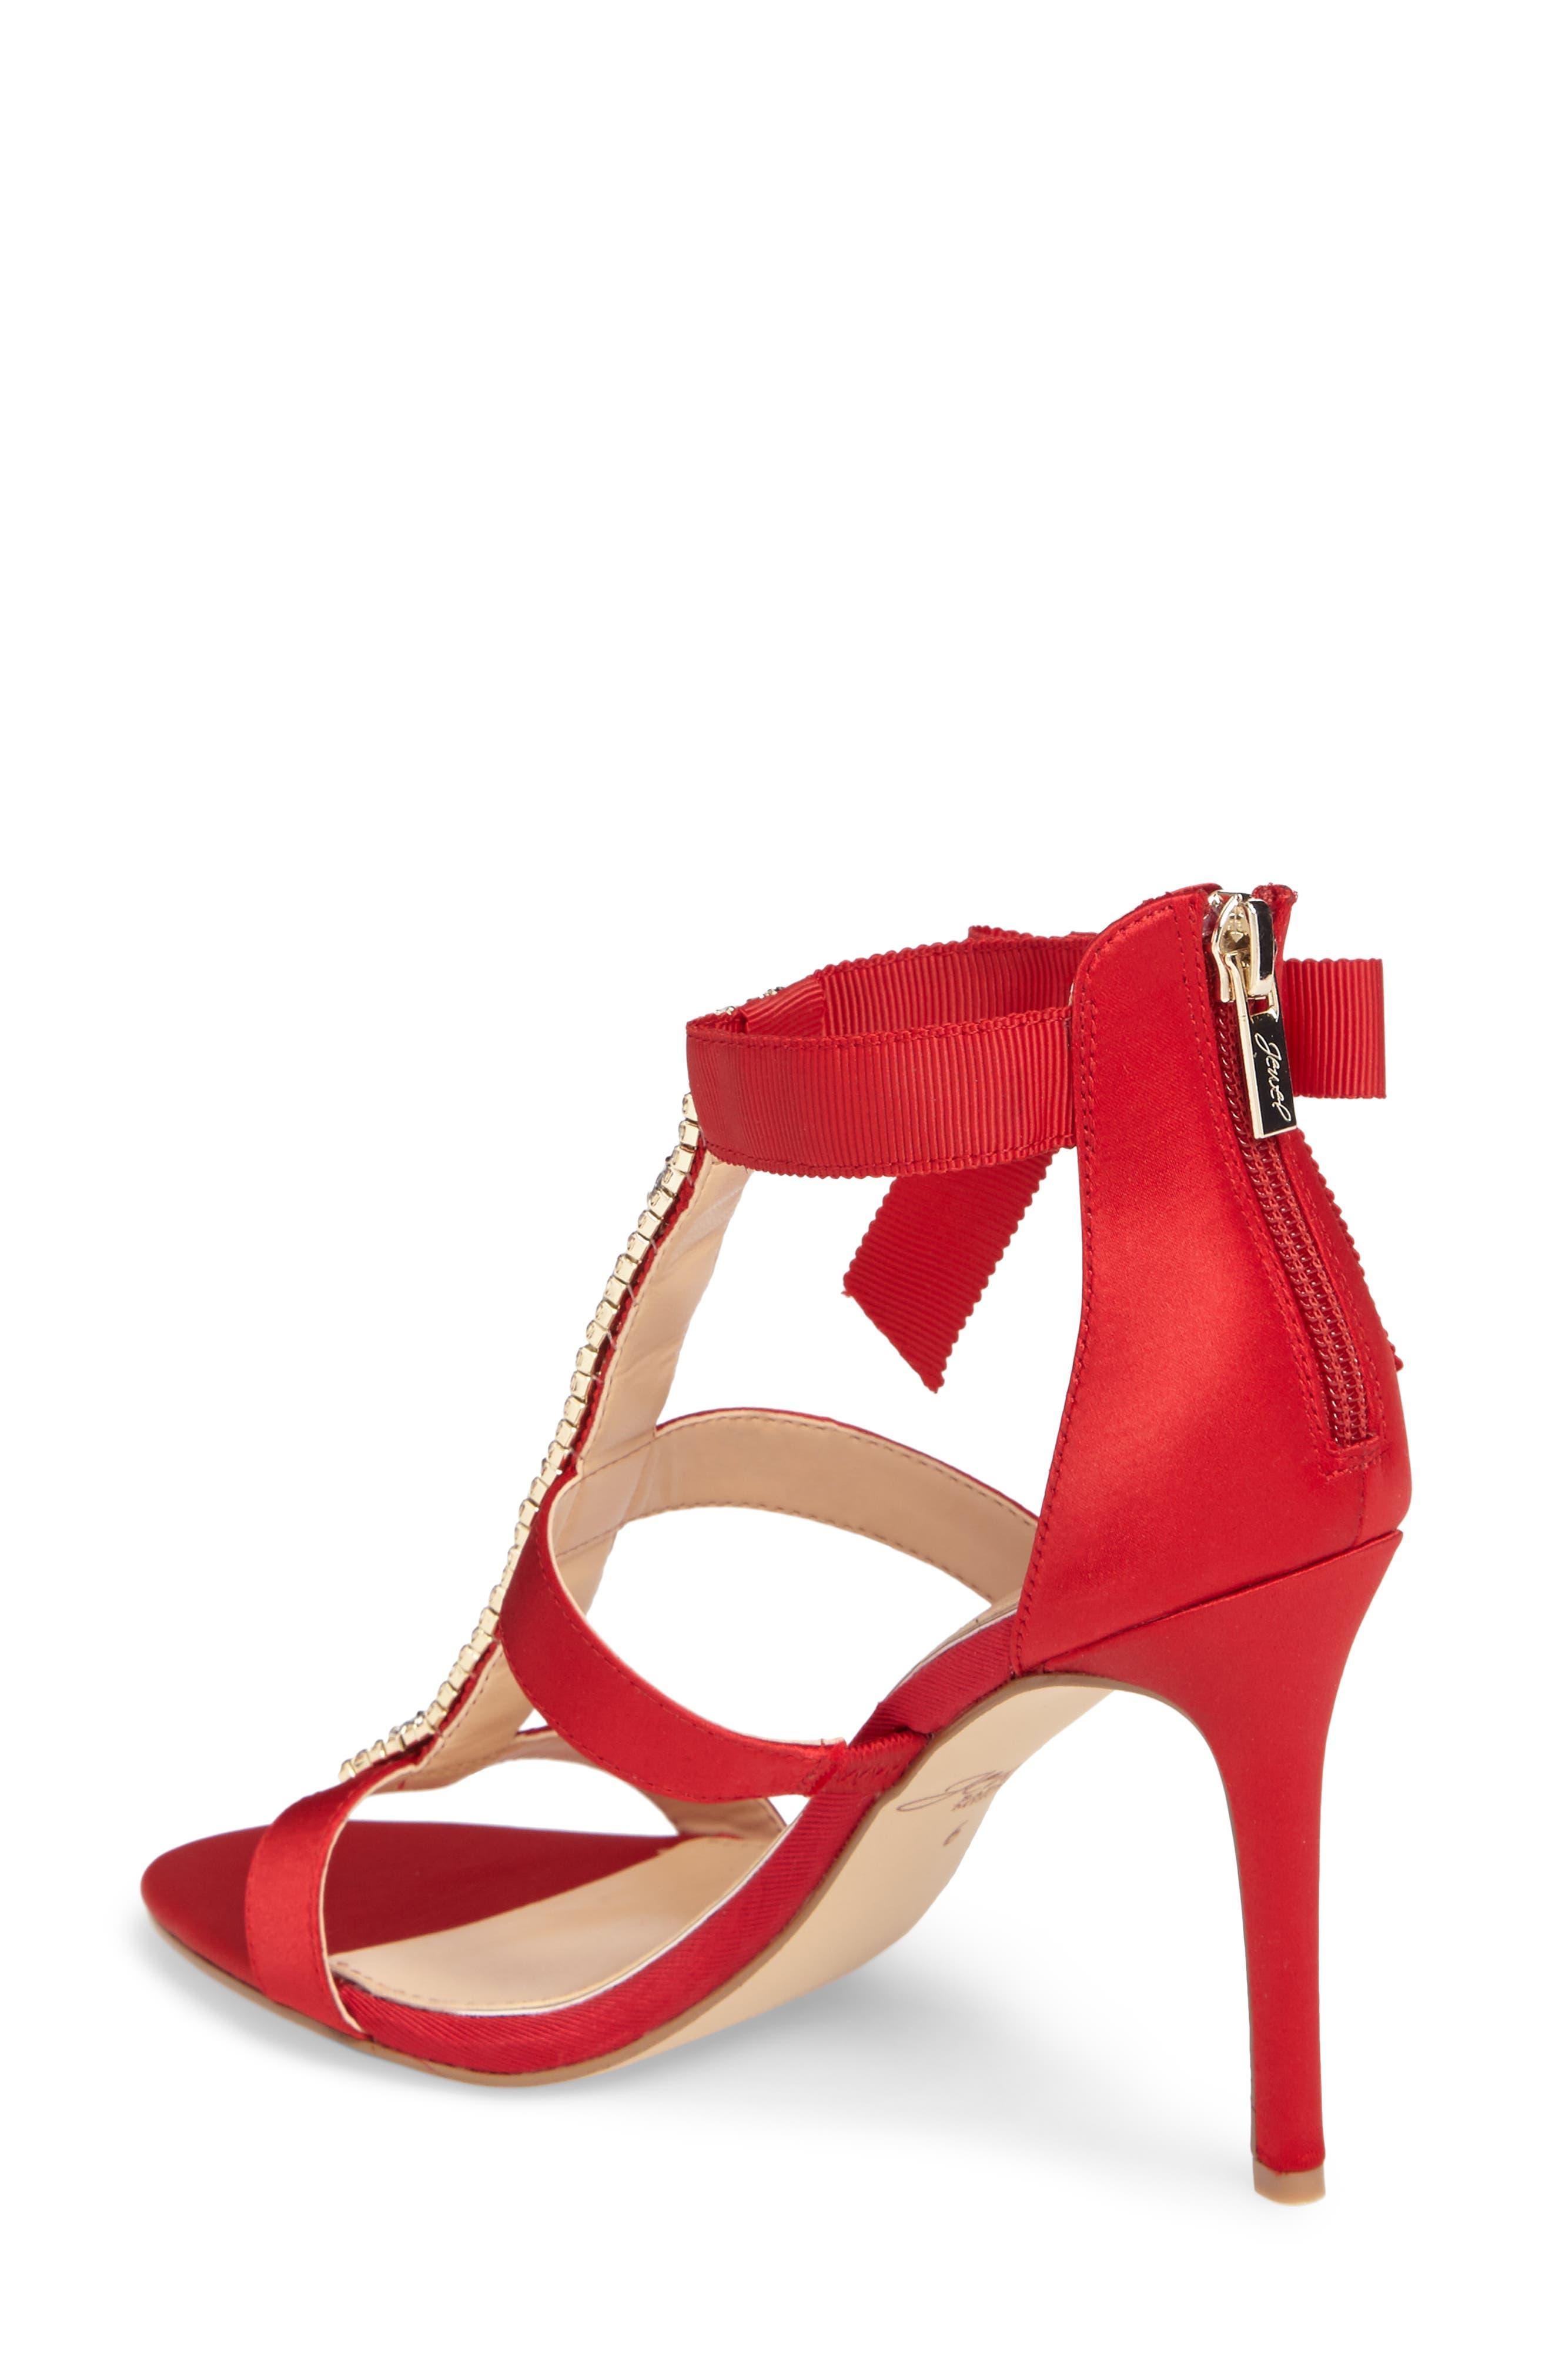 Henderson Embellished Bow Sandal,                             Alternate thumbnail 2, color,                             Red Satin